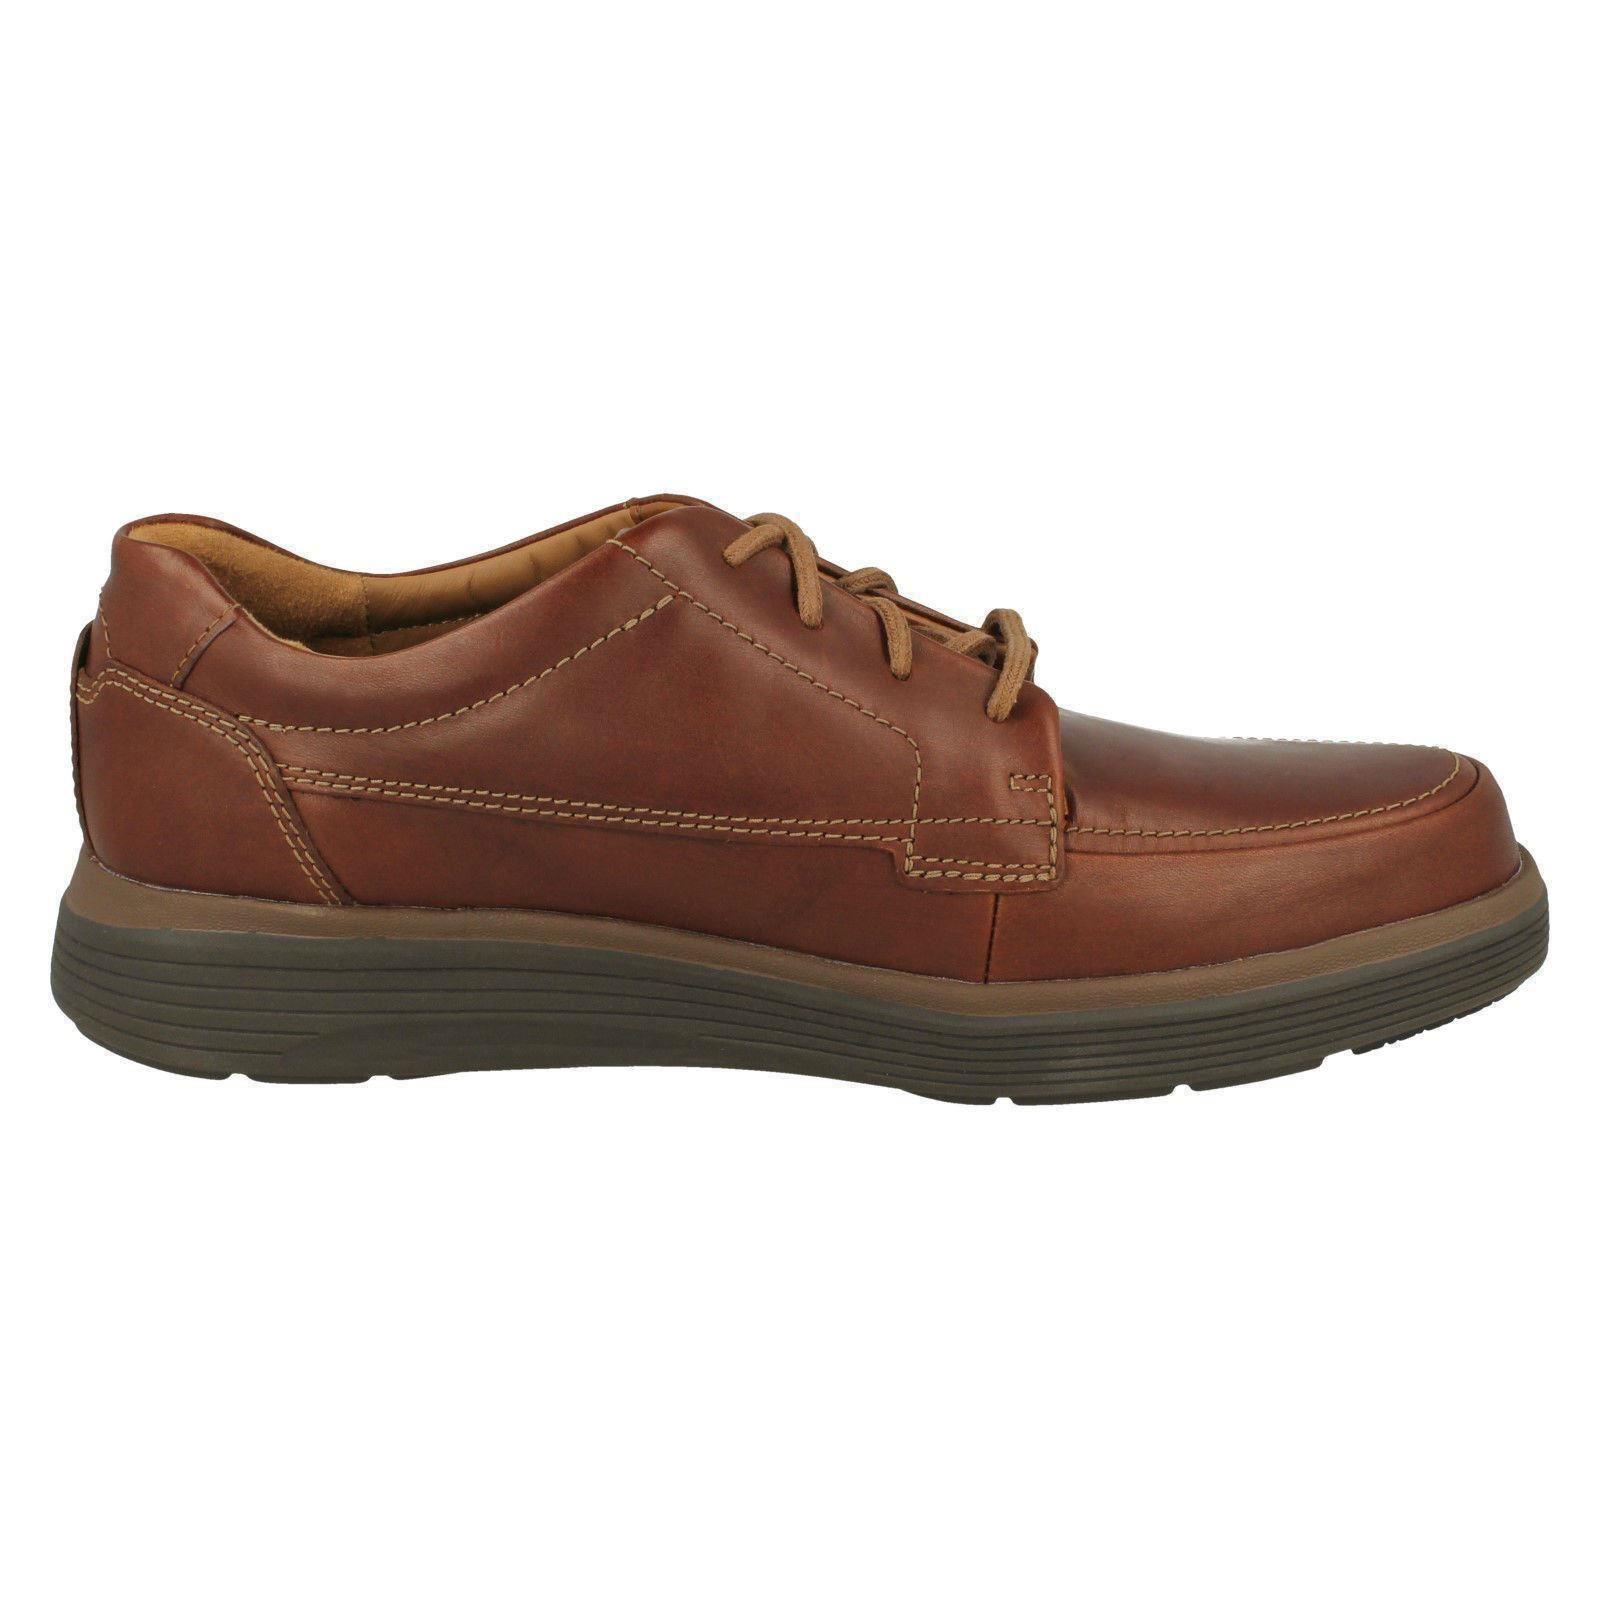 Uomo Clarks Lace Up Fastening 'Un Formal Leder Schuhes - 'Un Fastening Abode Ease' 0176c2